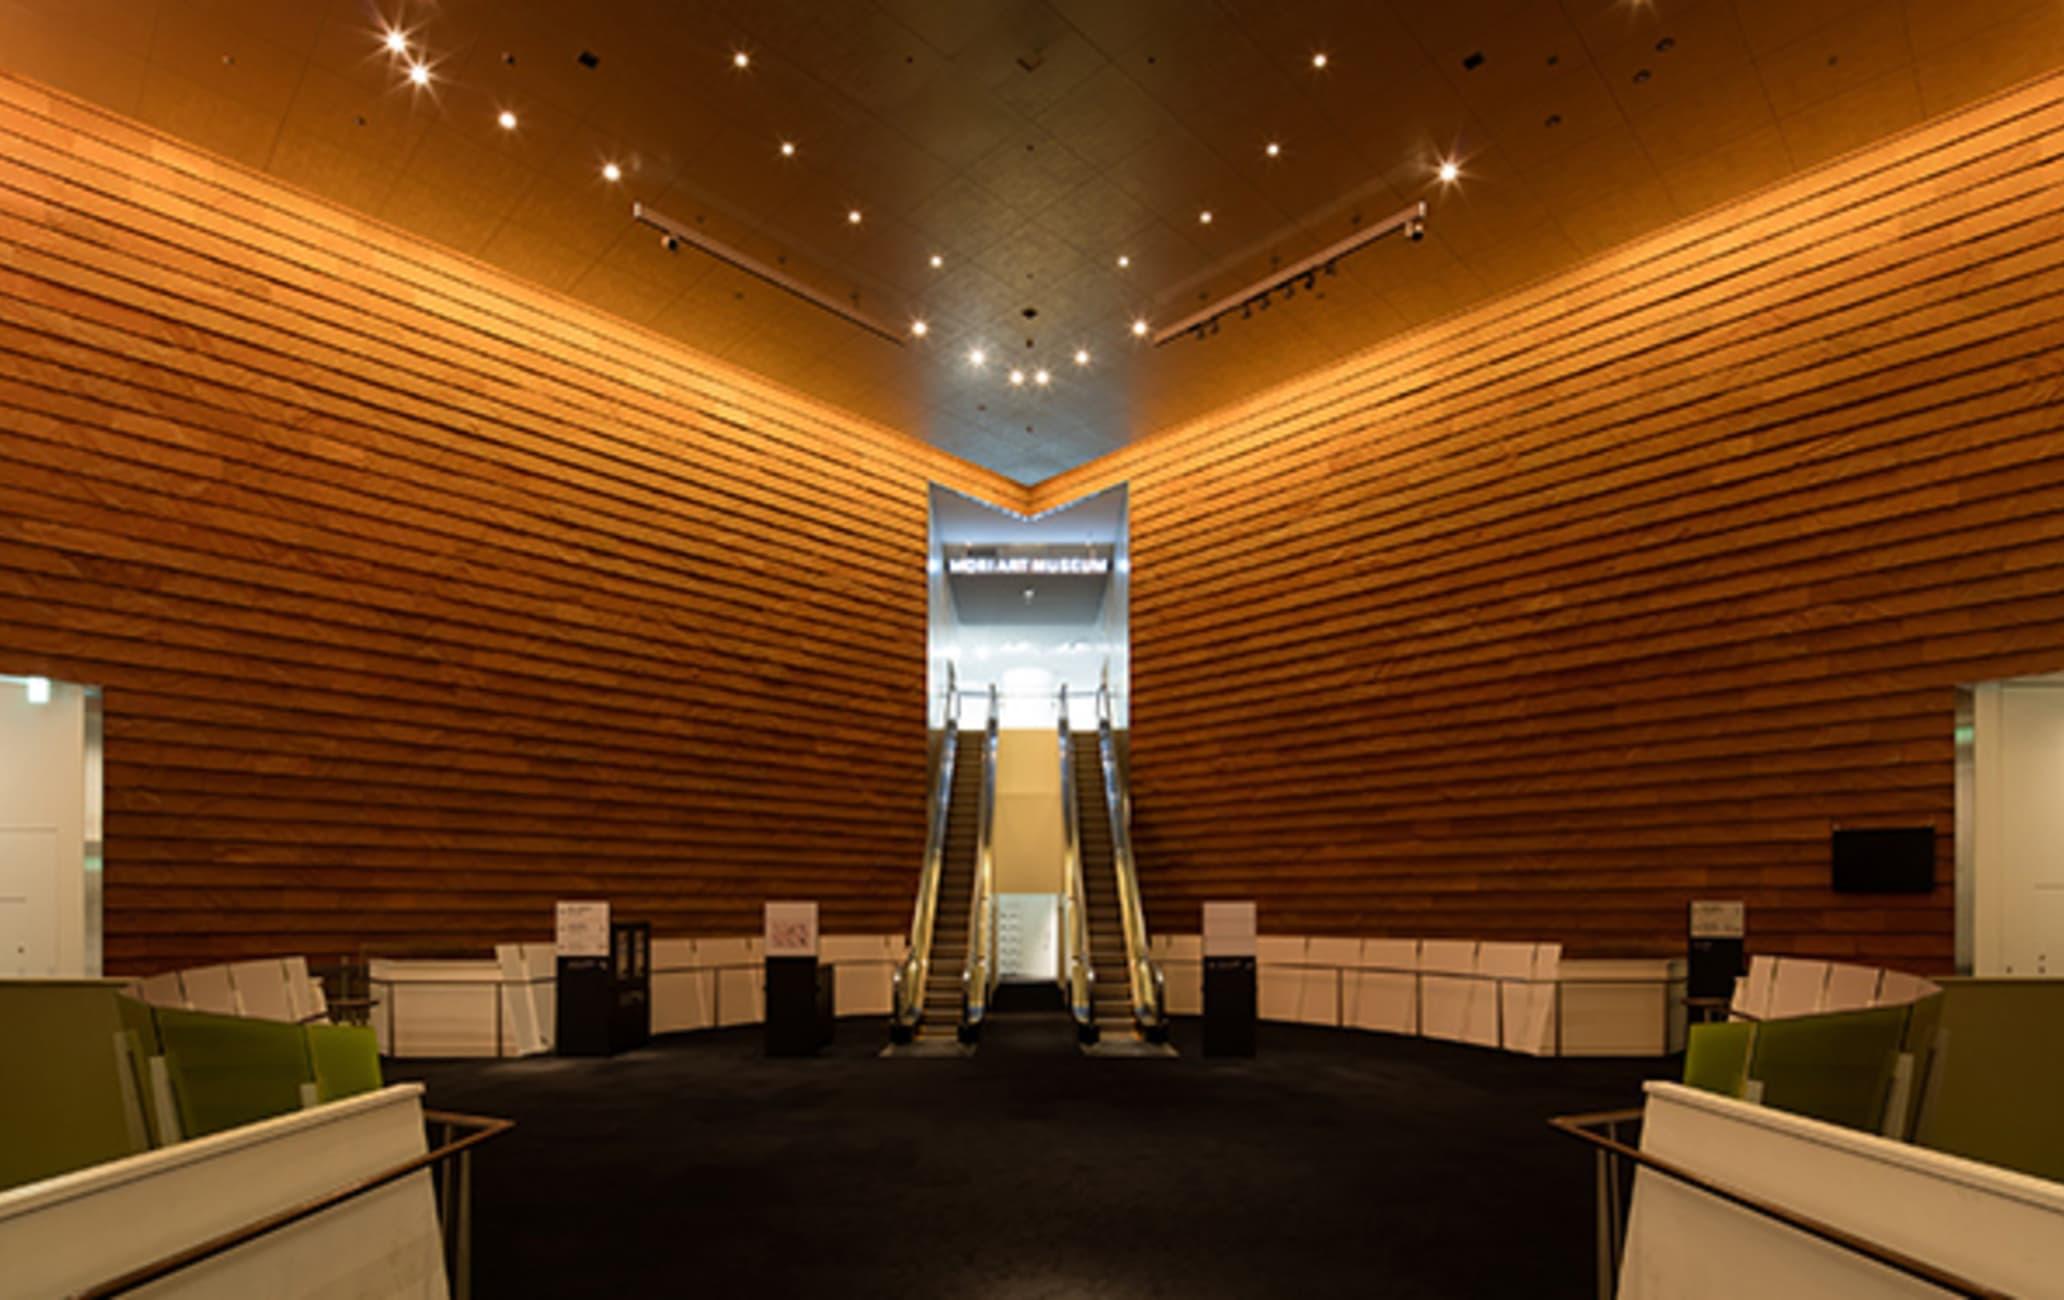 Mori Arts Center Gallery & Mori Art Museum